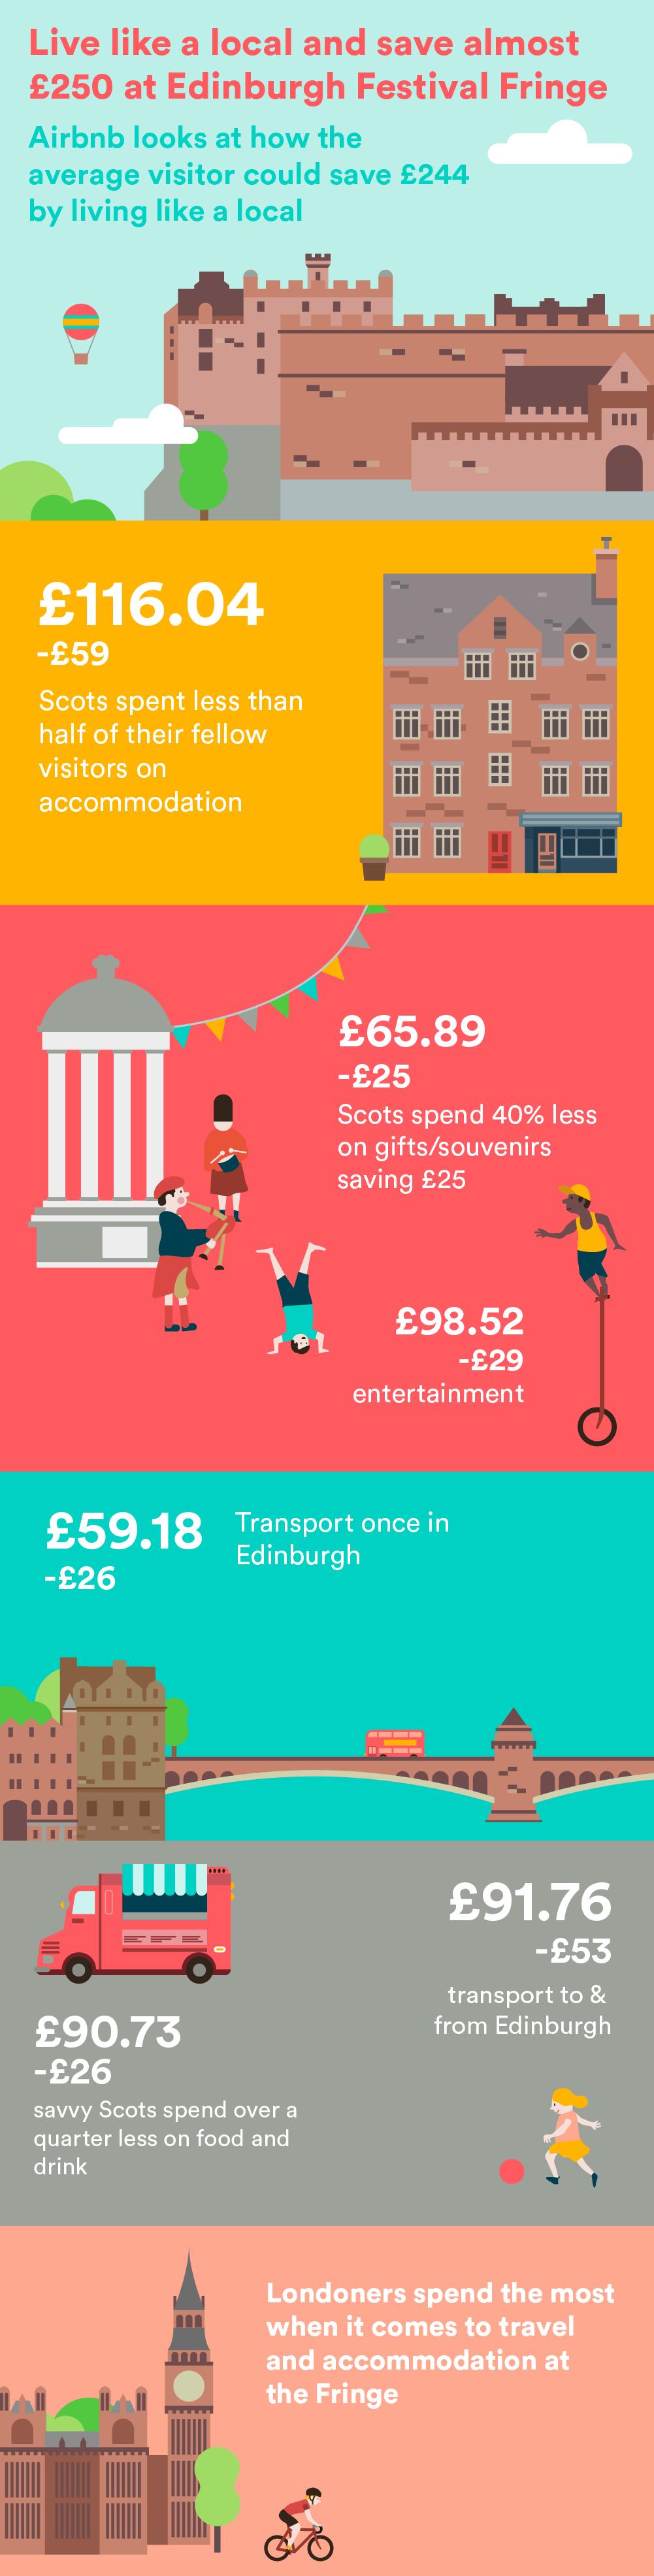 airbnb edinburgh fringe infographic